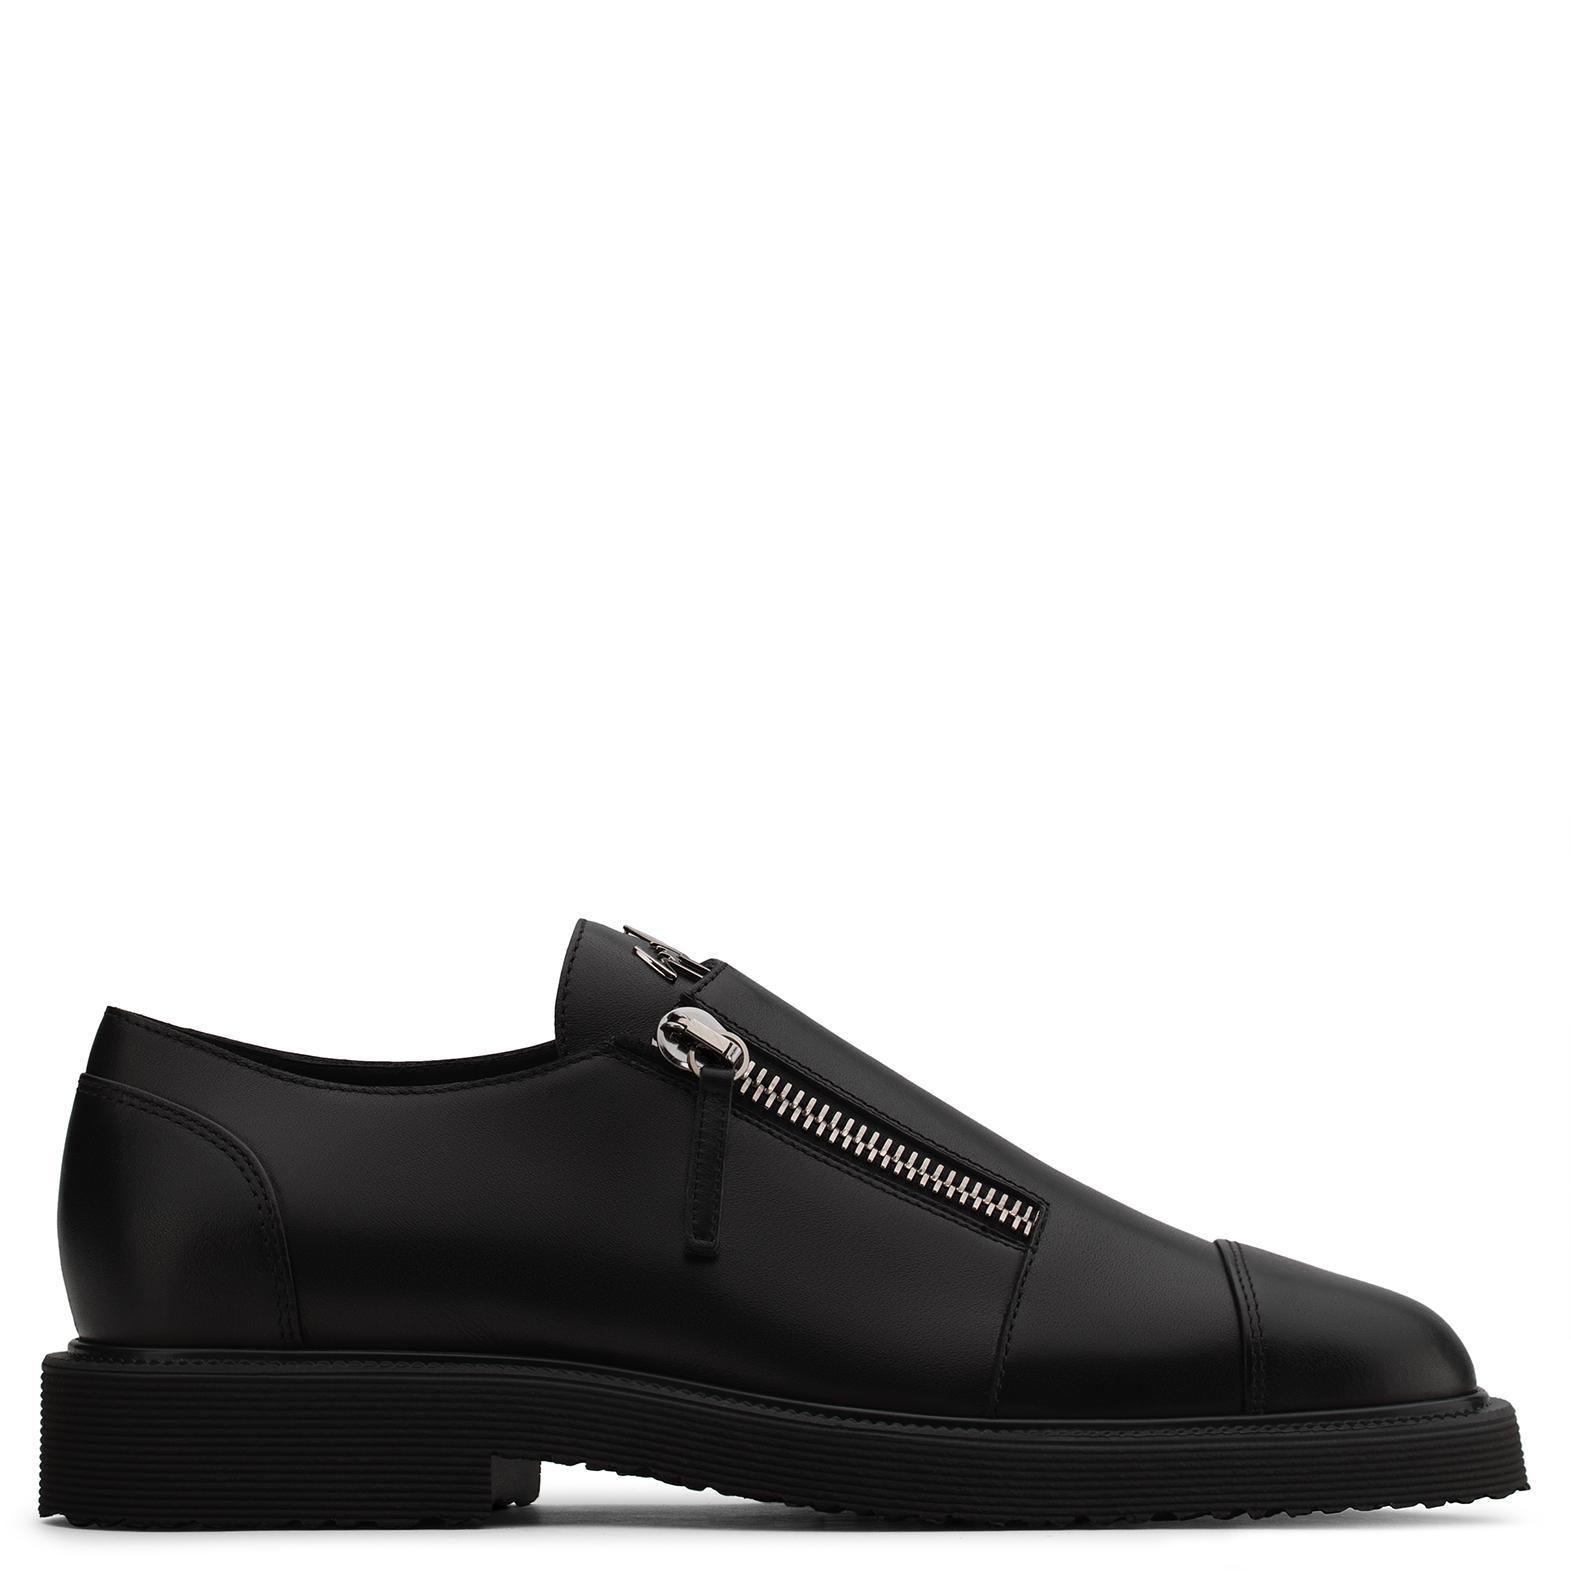 Giuseppe Zanotti Calf leather shoes JULIO S3kaw